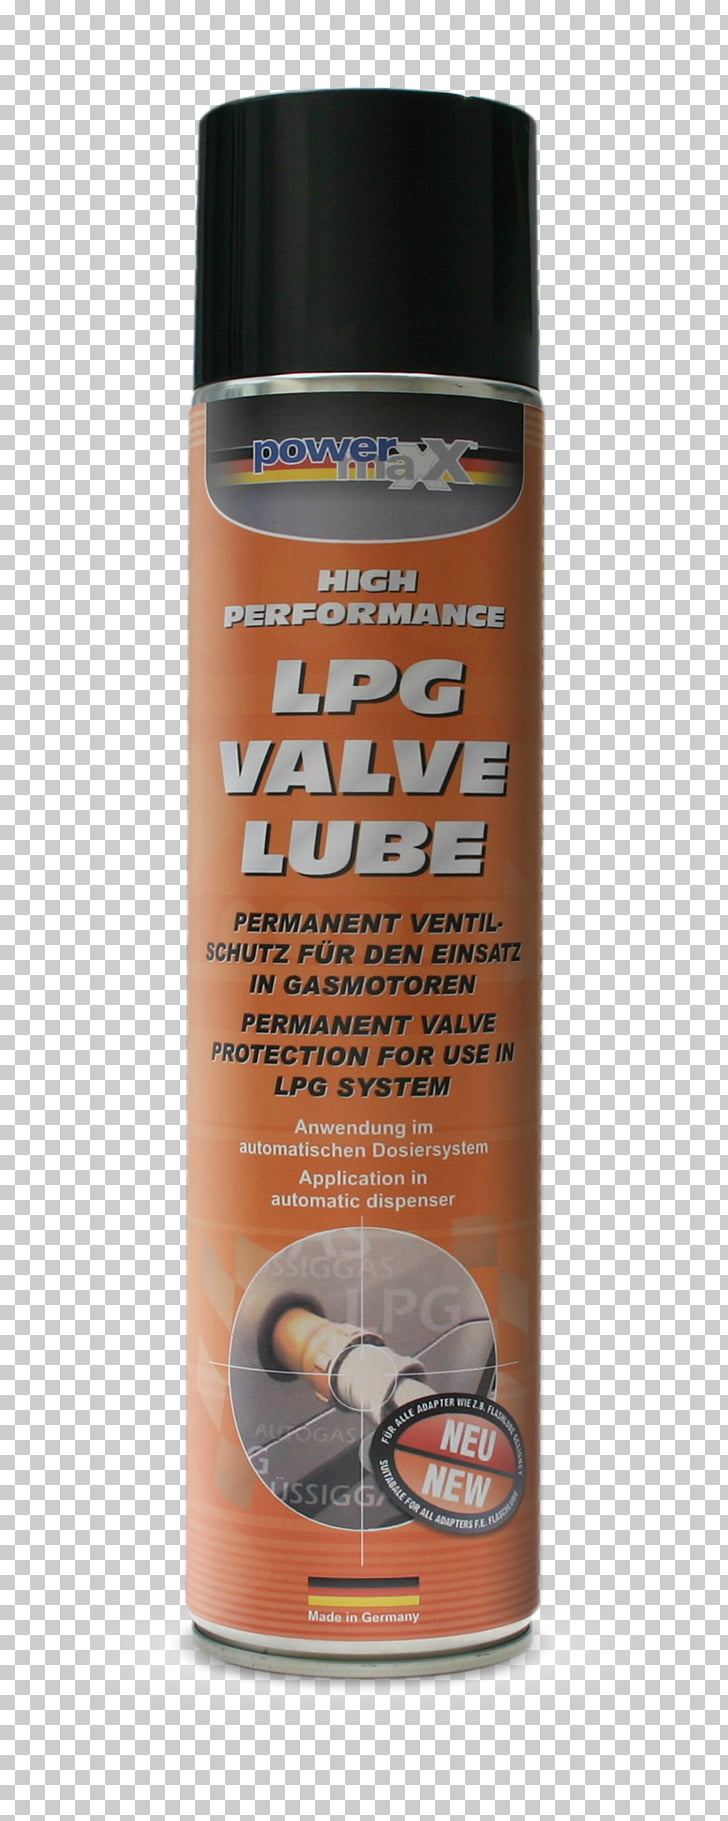 Liquefied petroleum gas Lubricant Globe valve Adalékanyag.